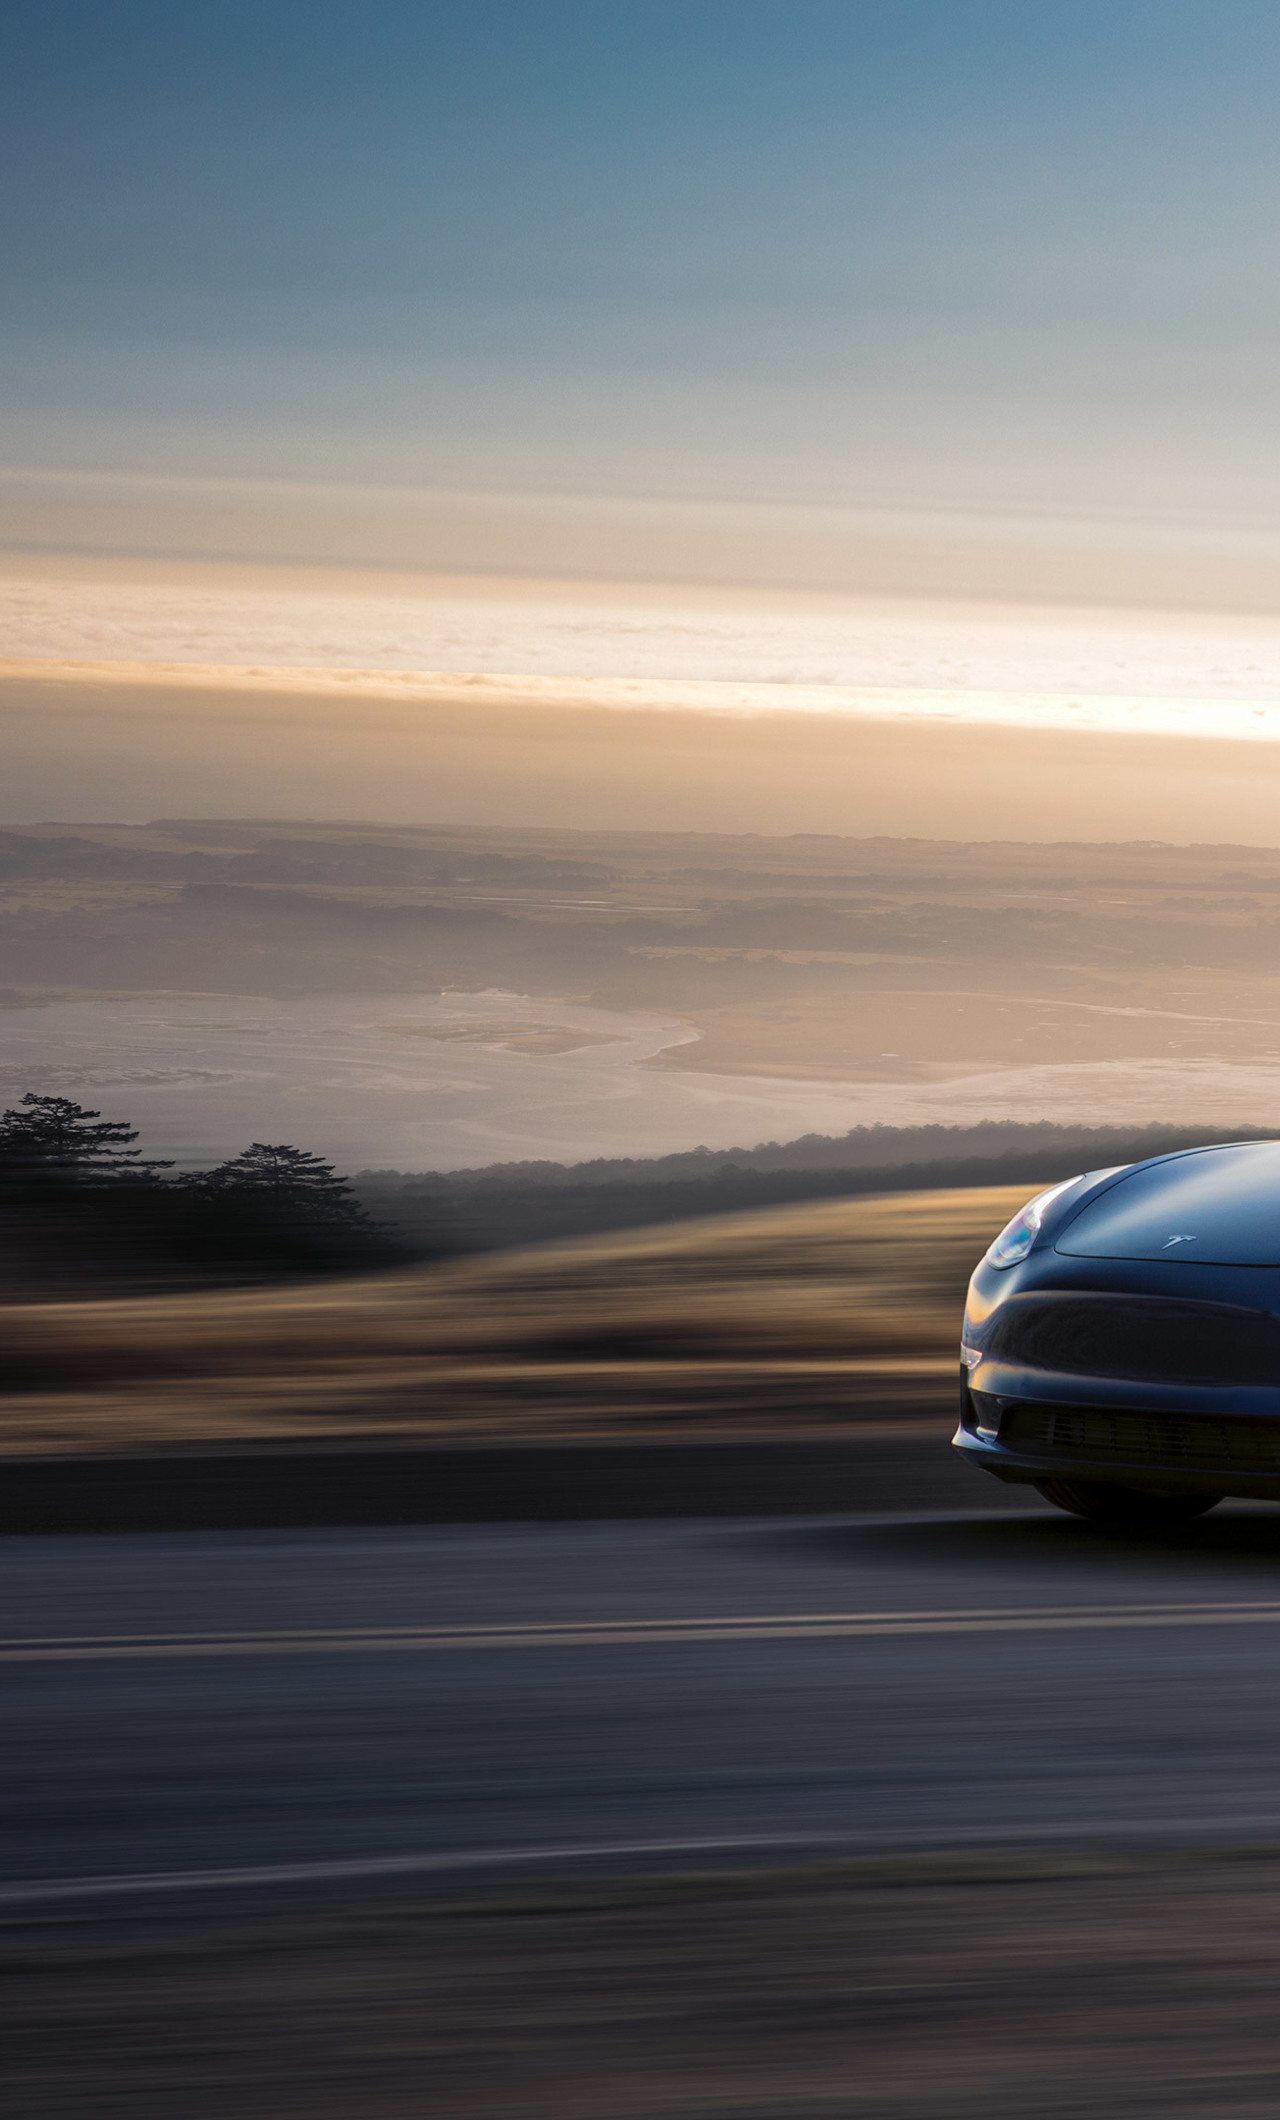 1280x2120 Tesla Model 3 2017 Iphone 6 Plus Wallpaper Hd